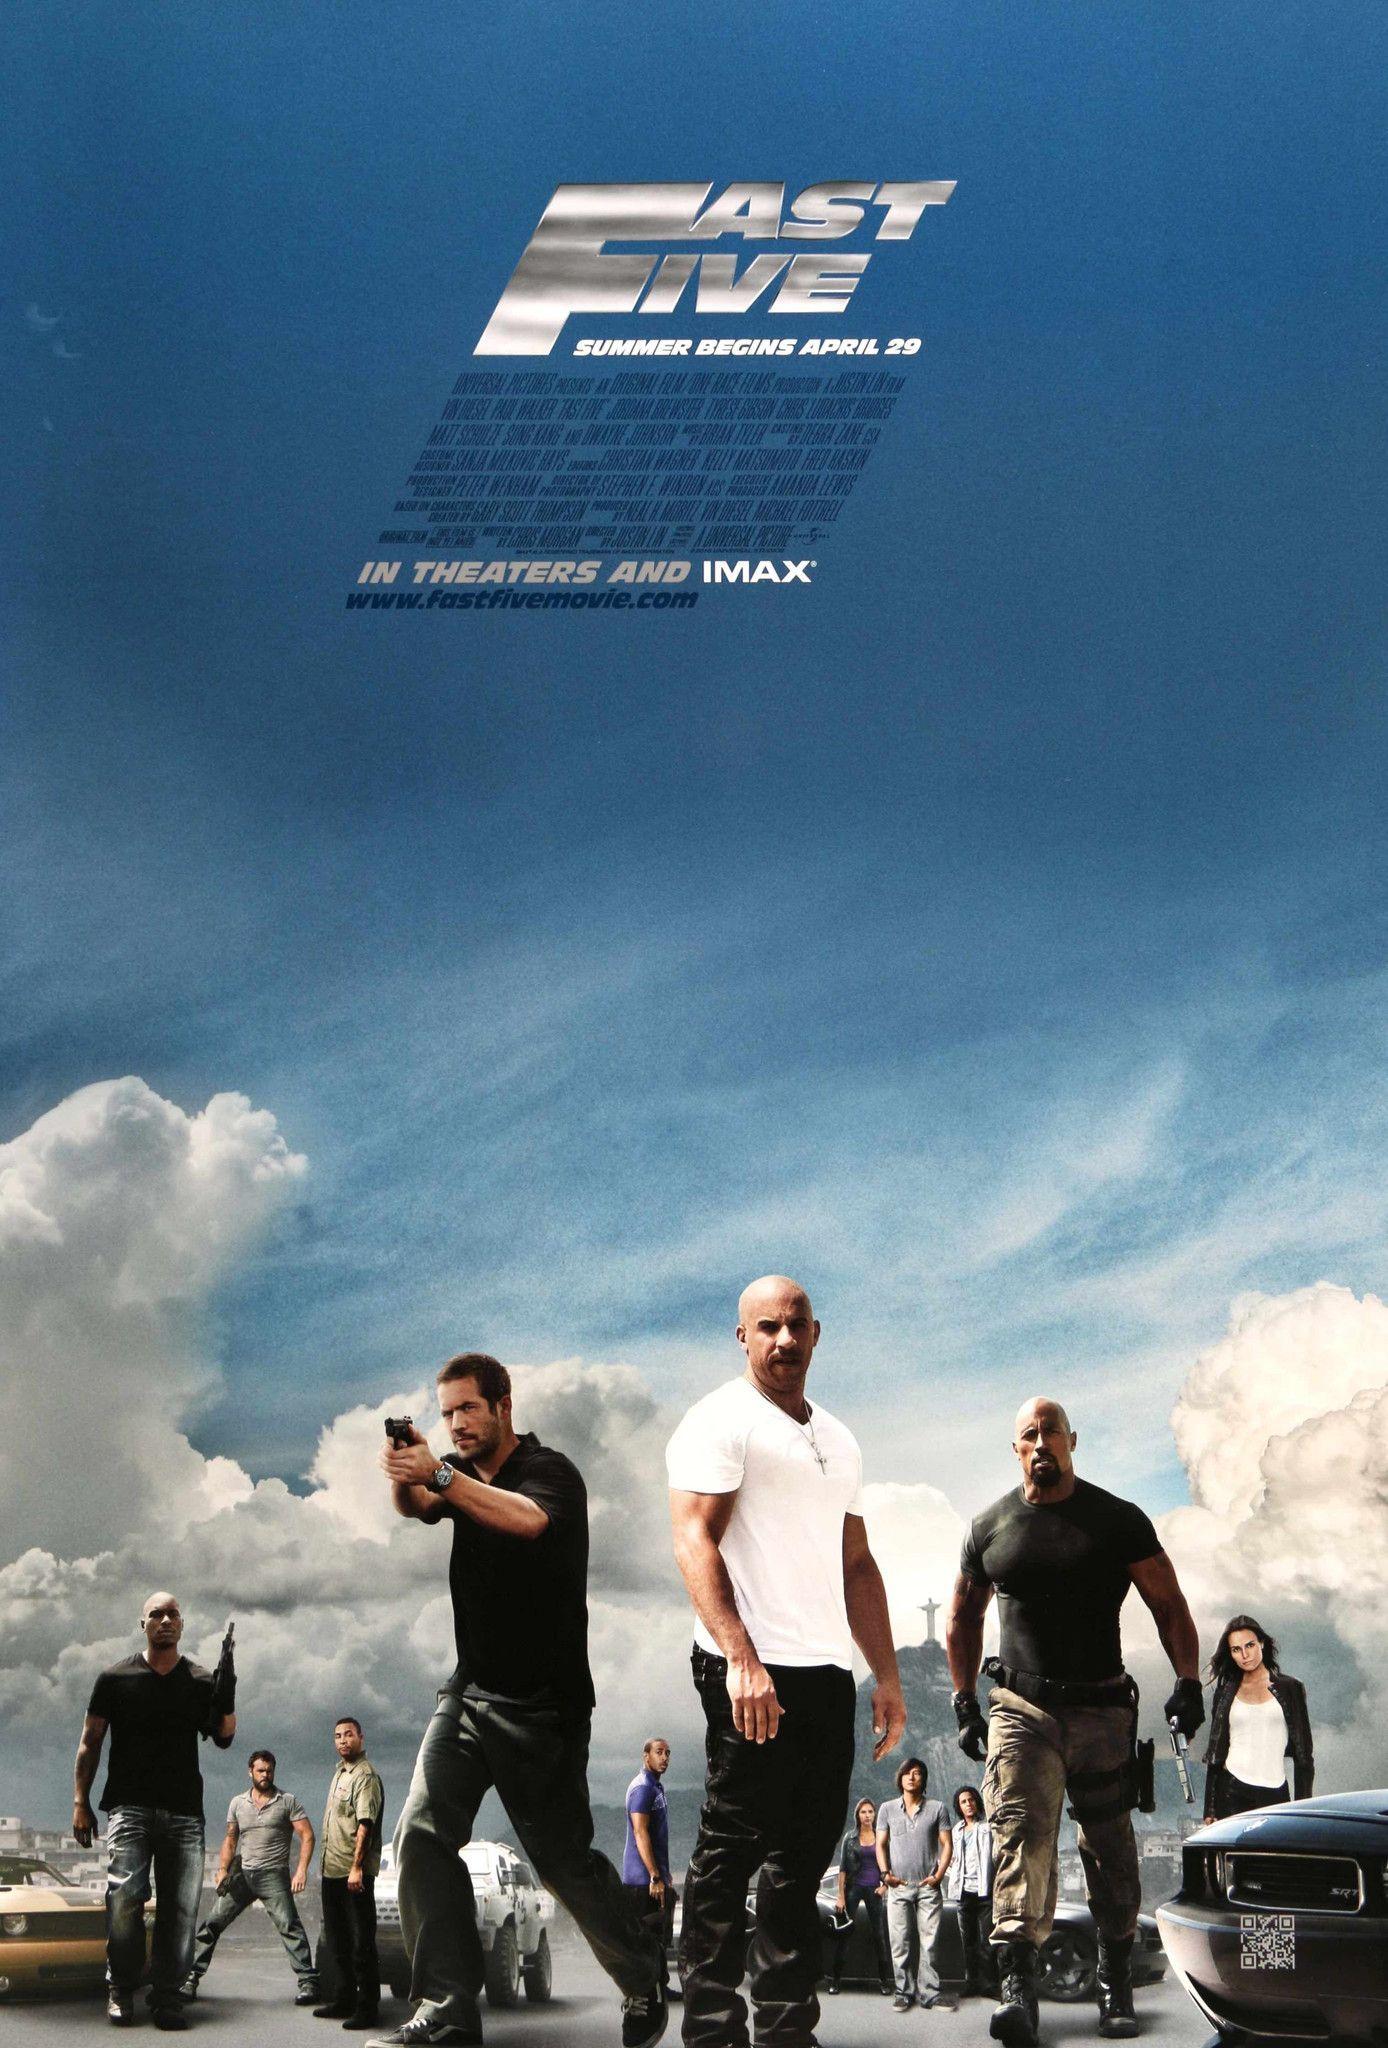 Fast Five (2011) | Fast five, Furious movie, Fast & furious 5